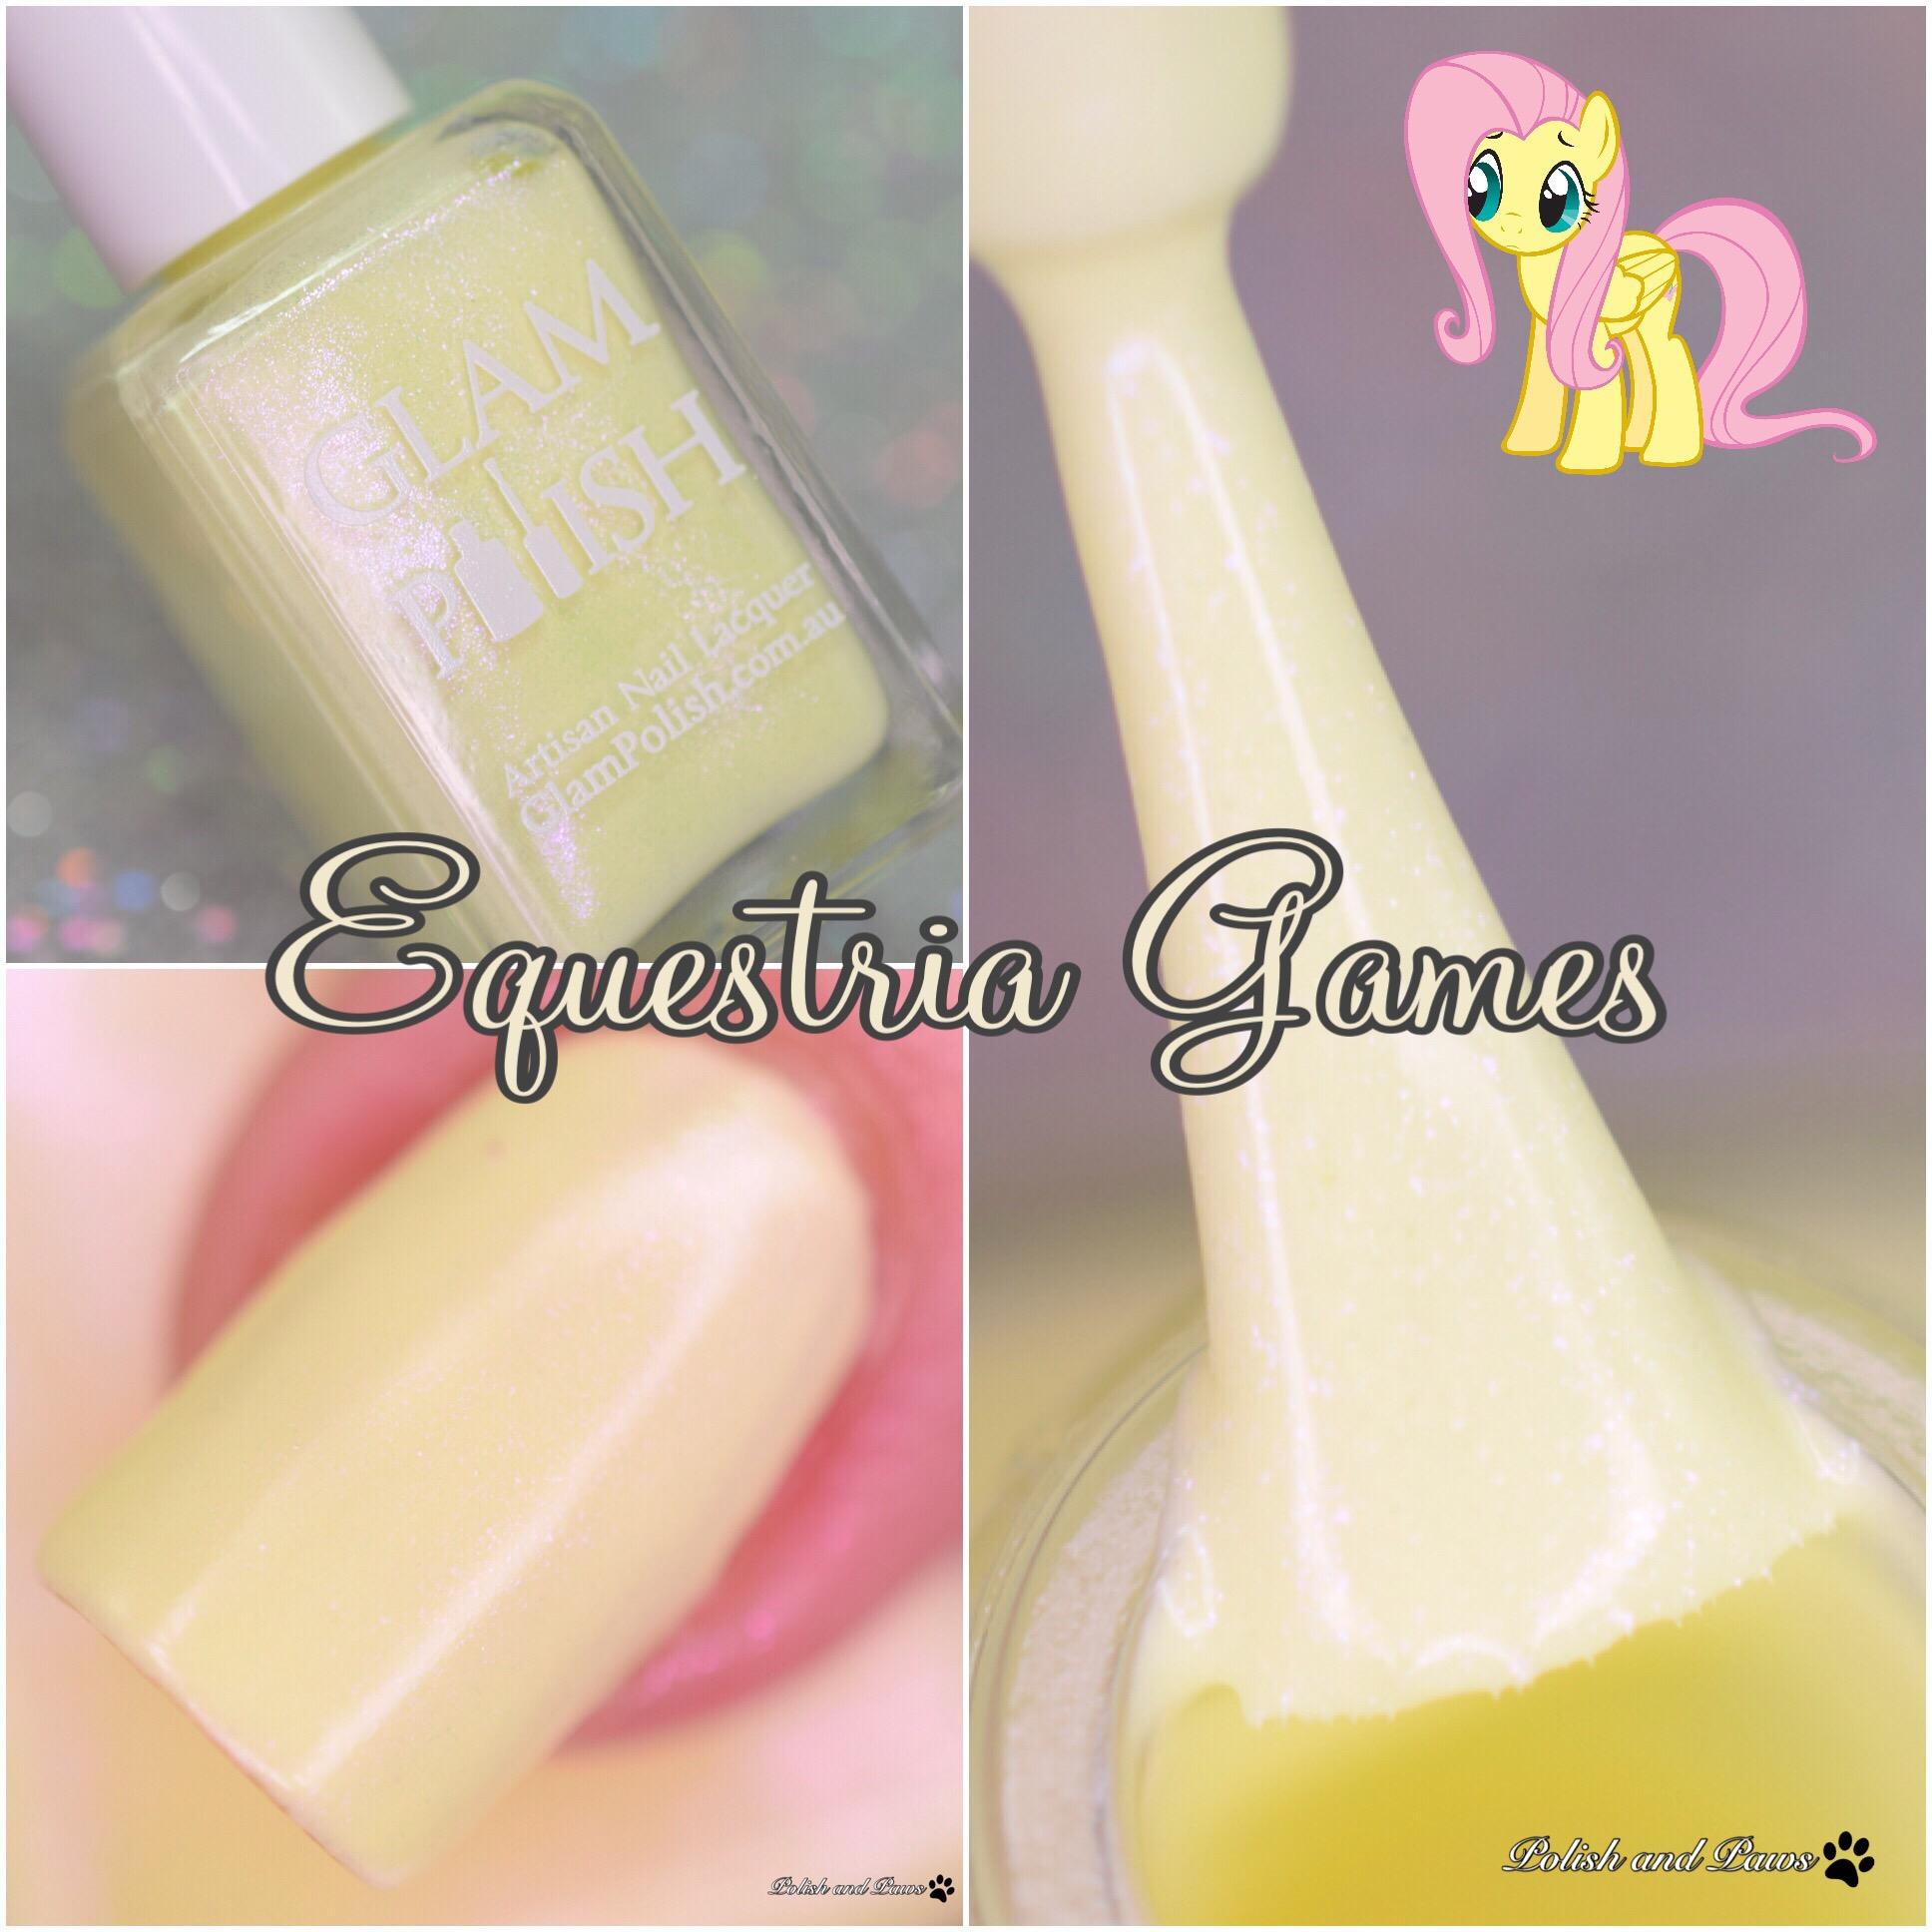 Glam Polish Equestria Games